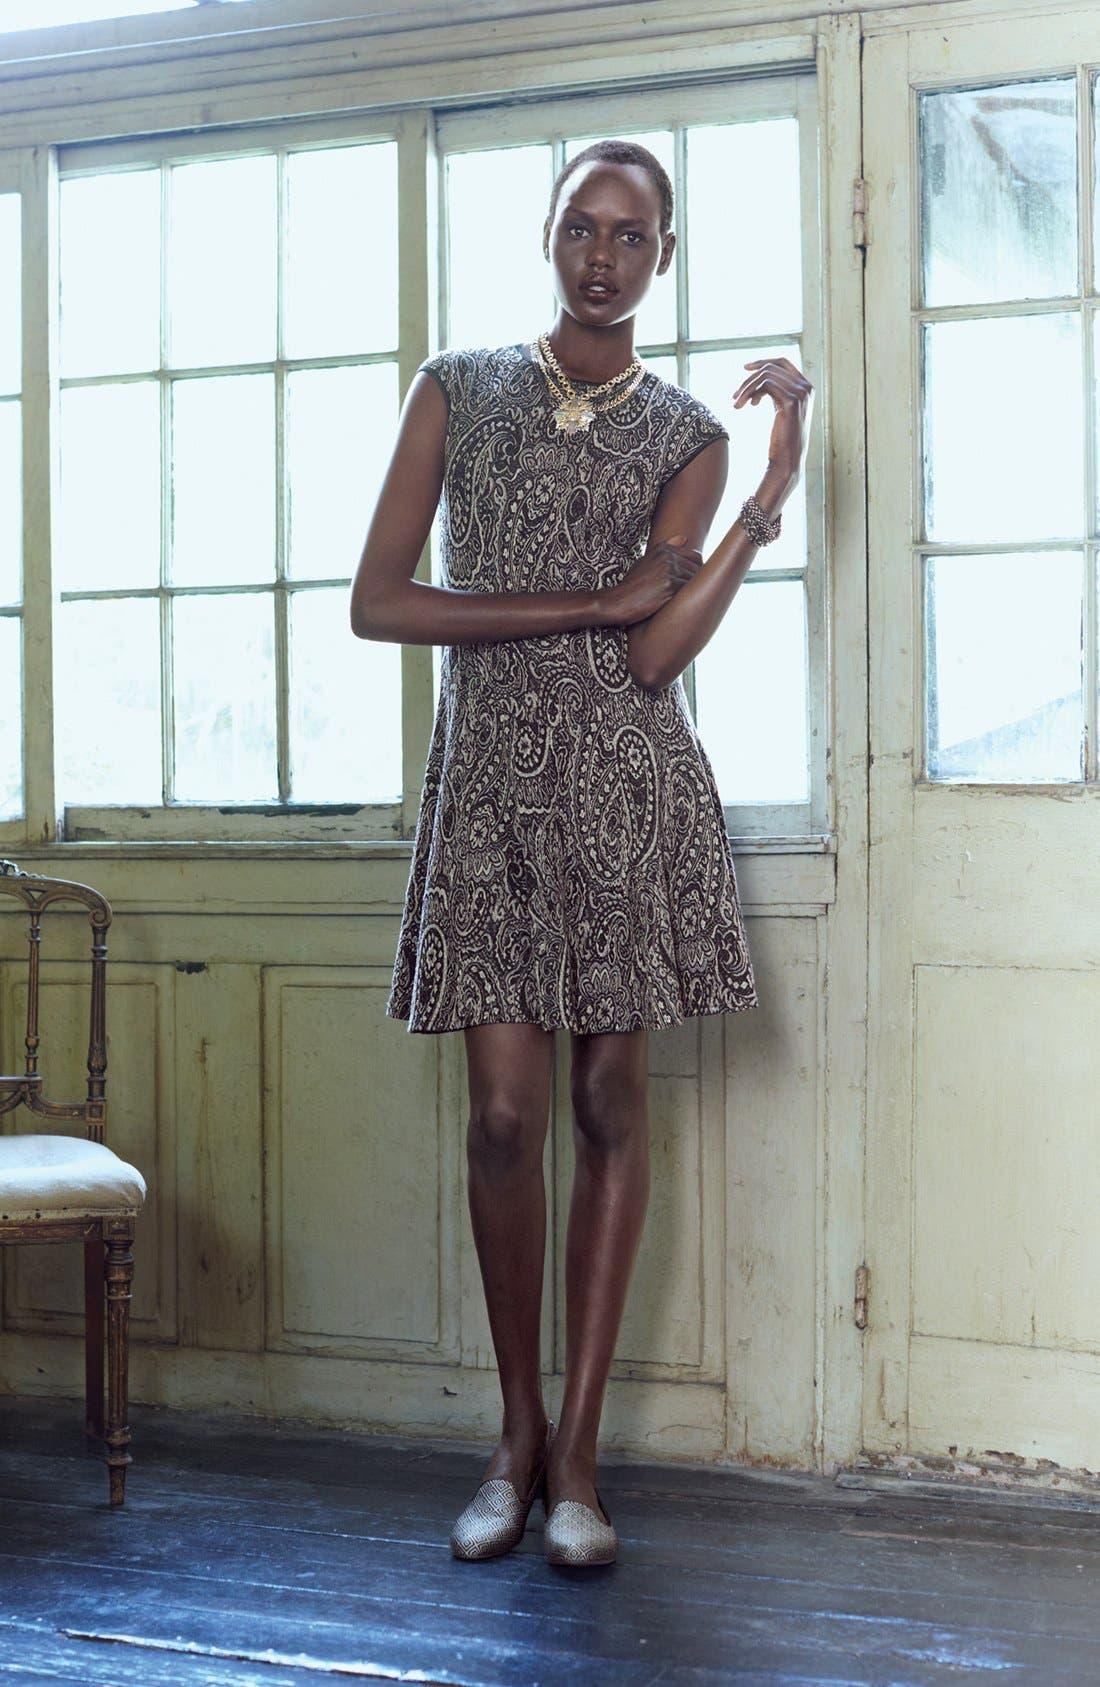 Main Image - Gabby Skye Sweater Dress & Accessories